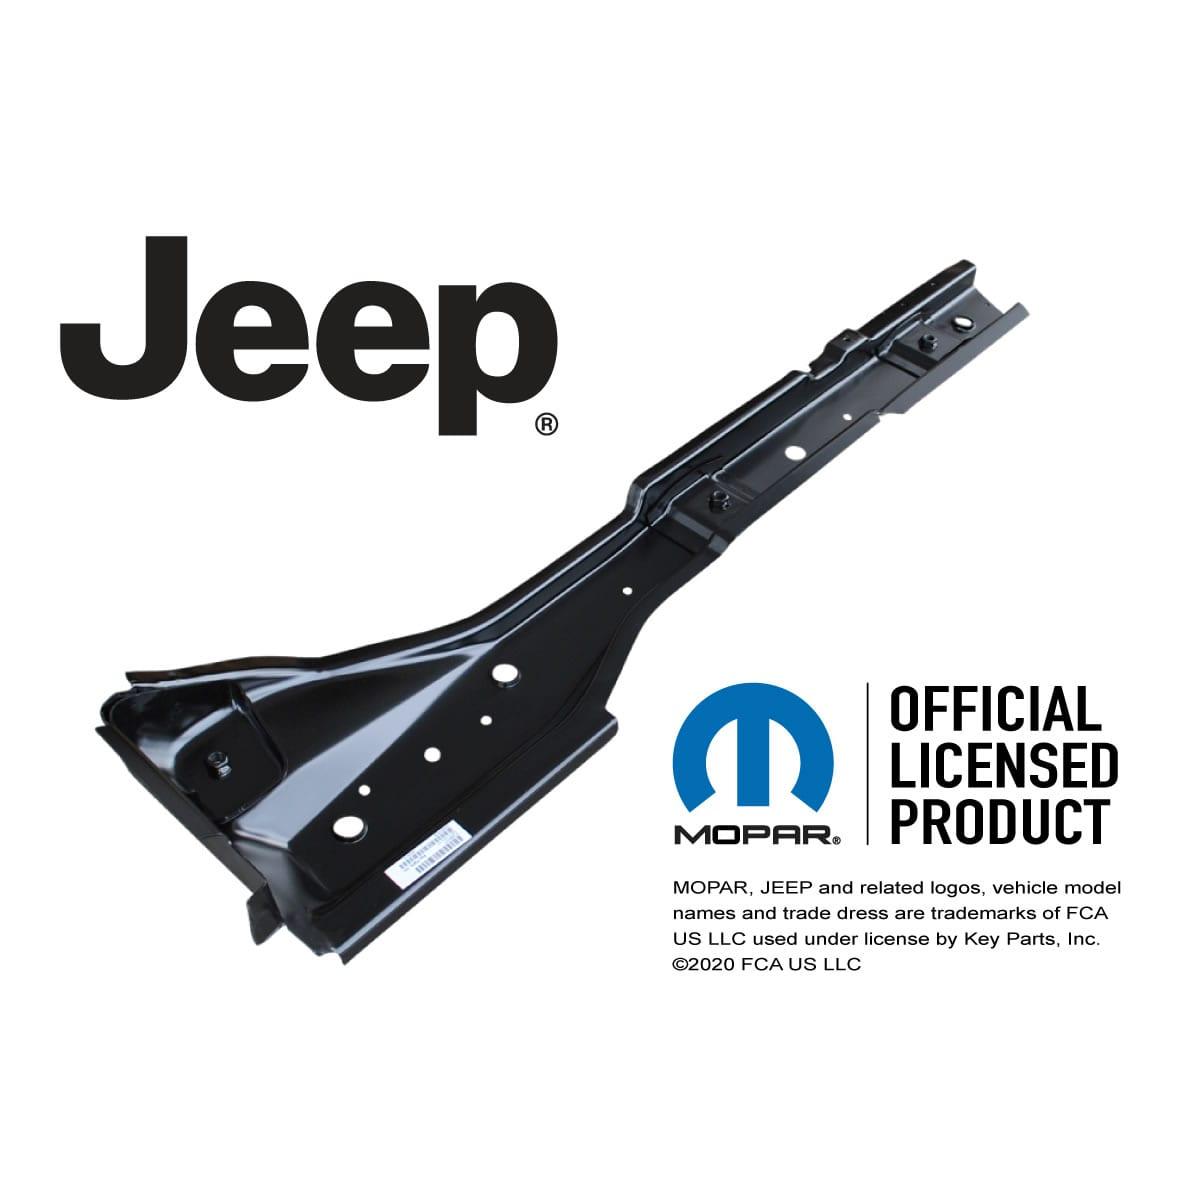 Key Parts 0485-317 Torque Box 1997-2006 Jeep Wrangler TJ Driver Side